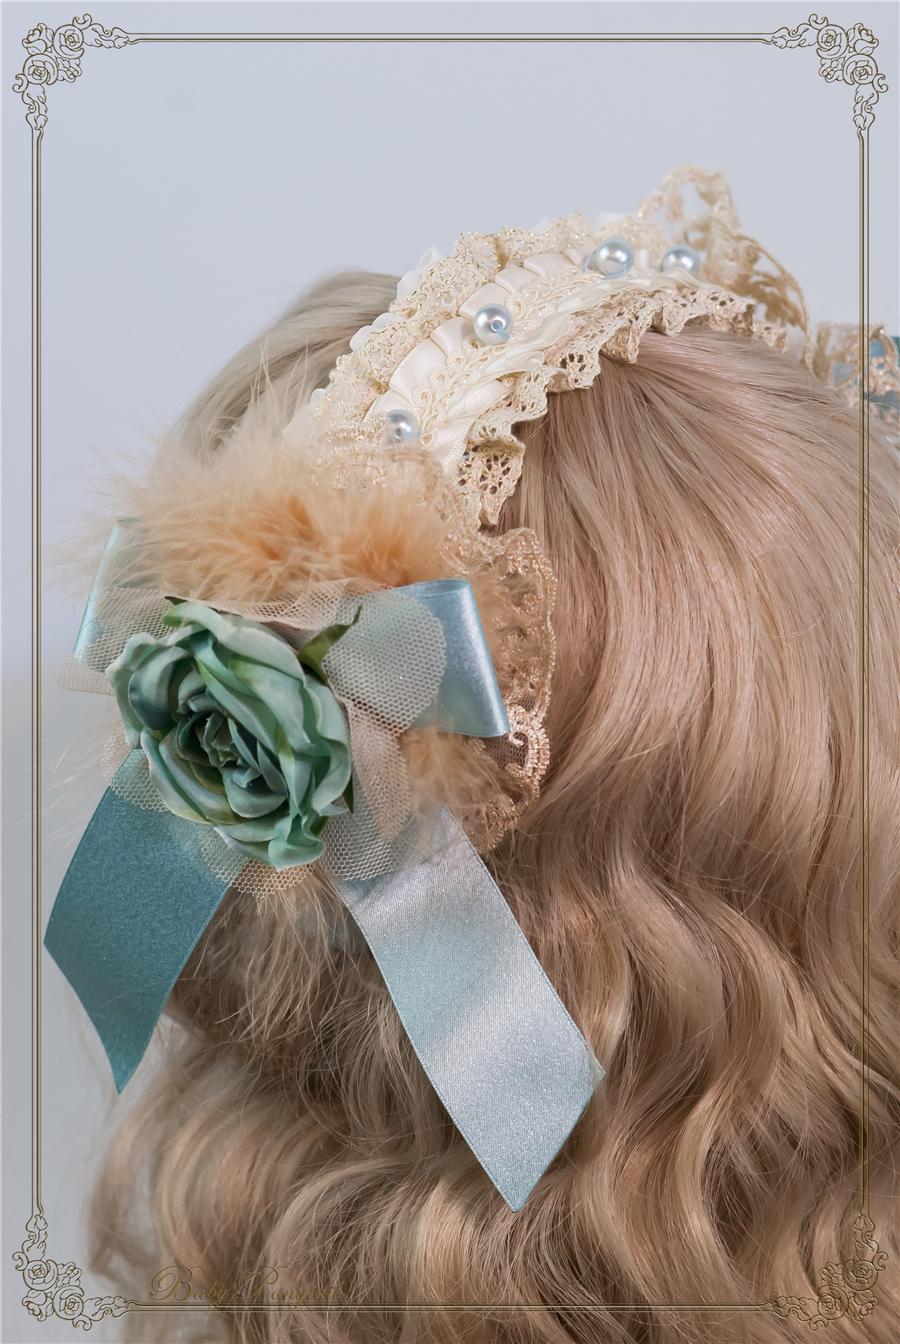 Baby Ponytail_Stock photo_Circus Princess_Rose Head Dress Sax_01.jpg